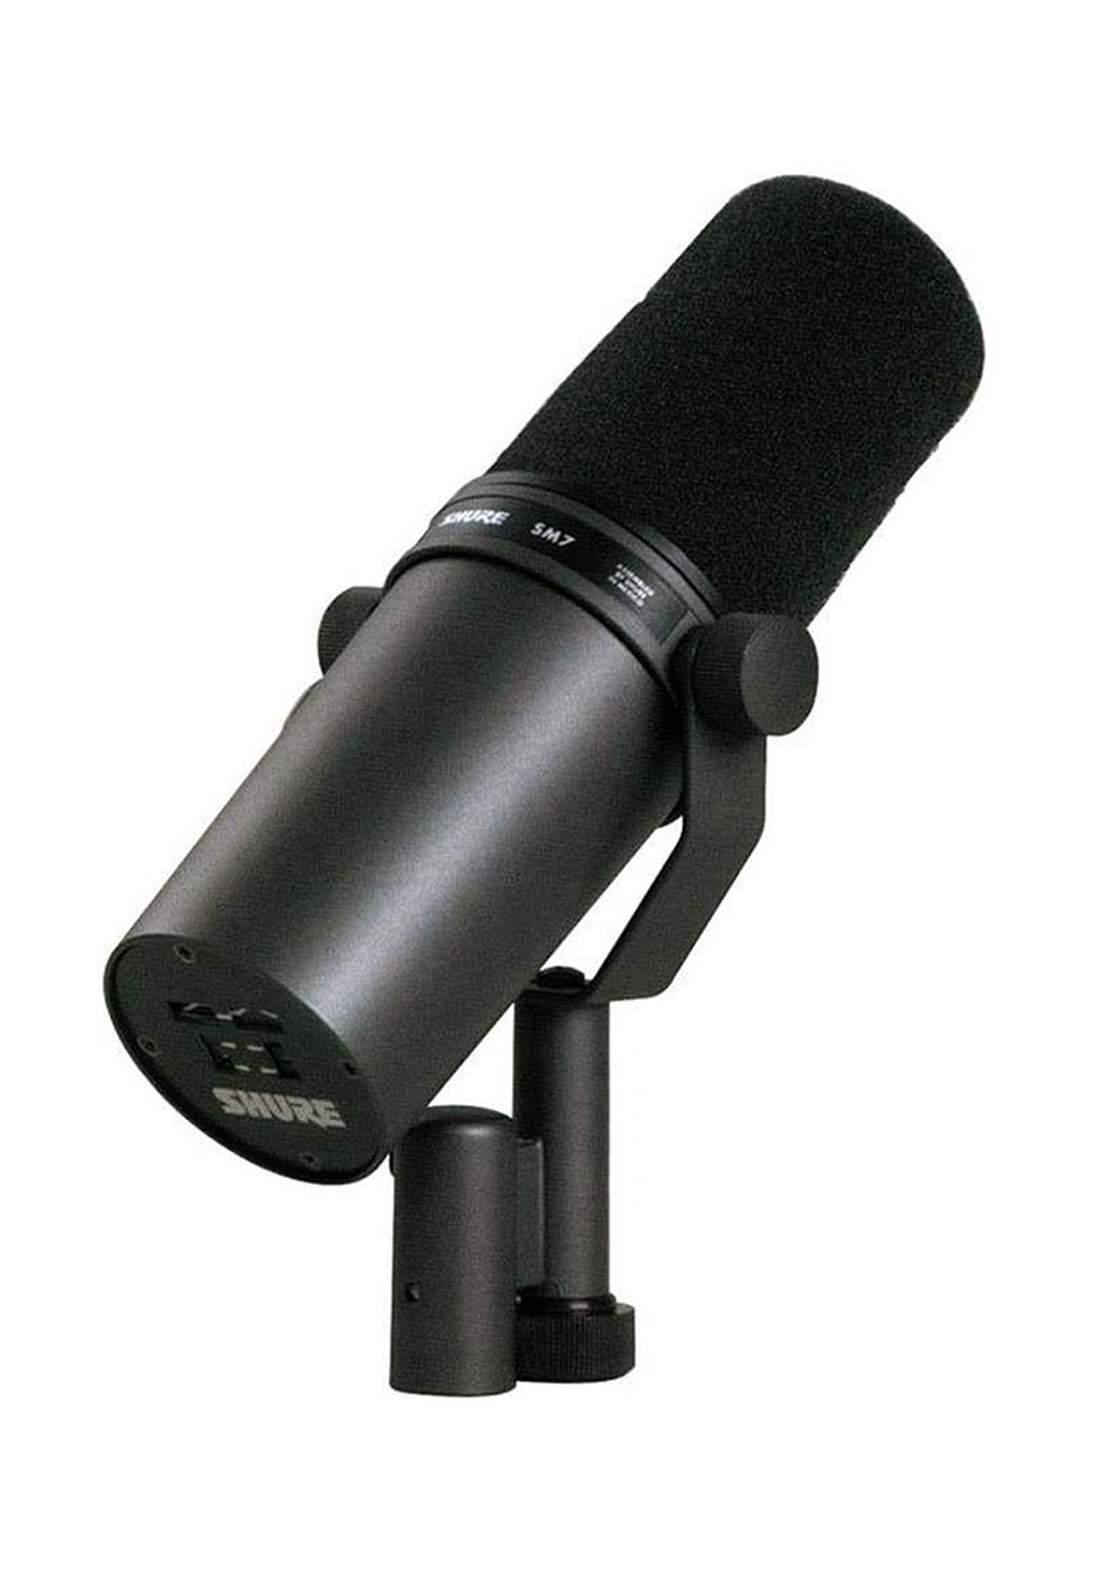 Shure Microphone مايكروفون